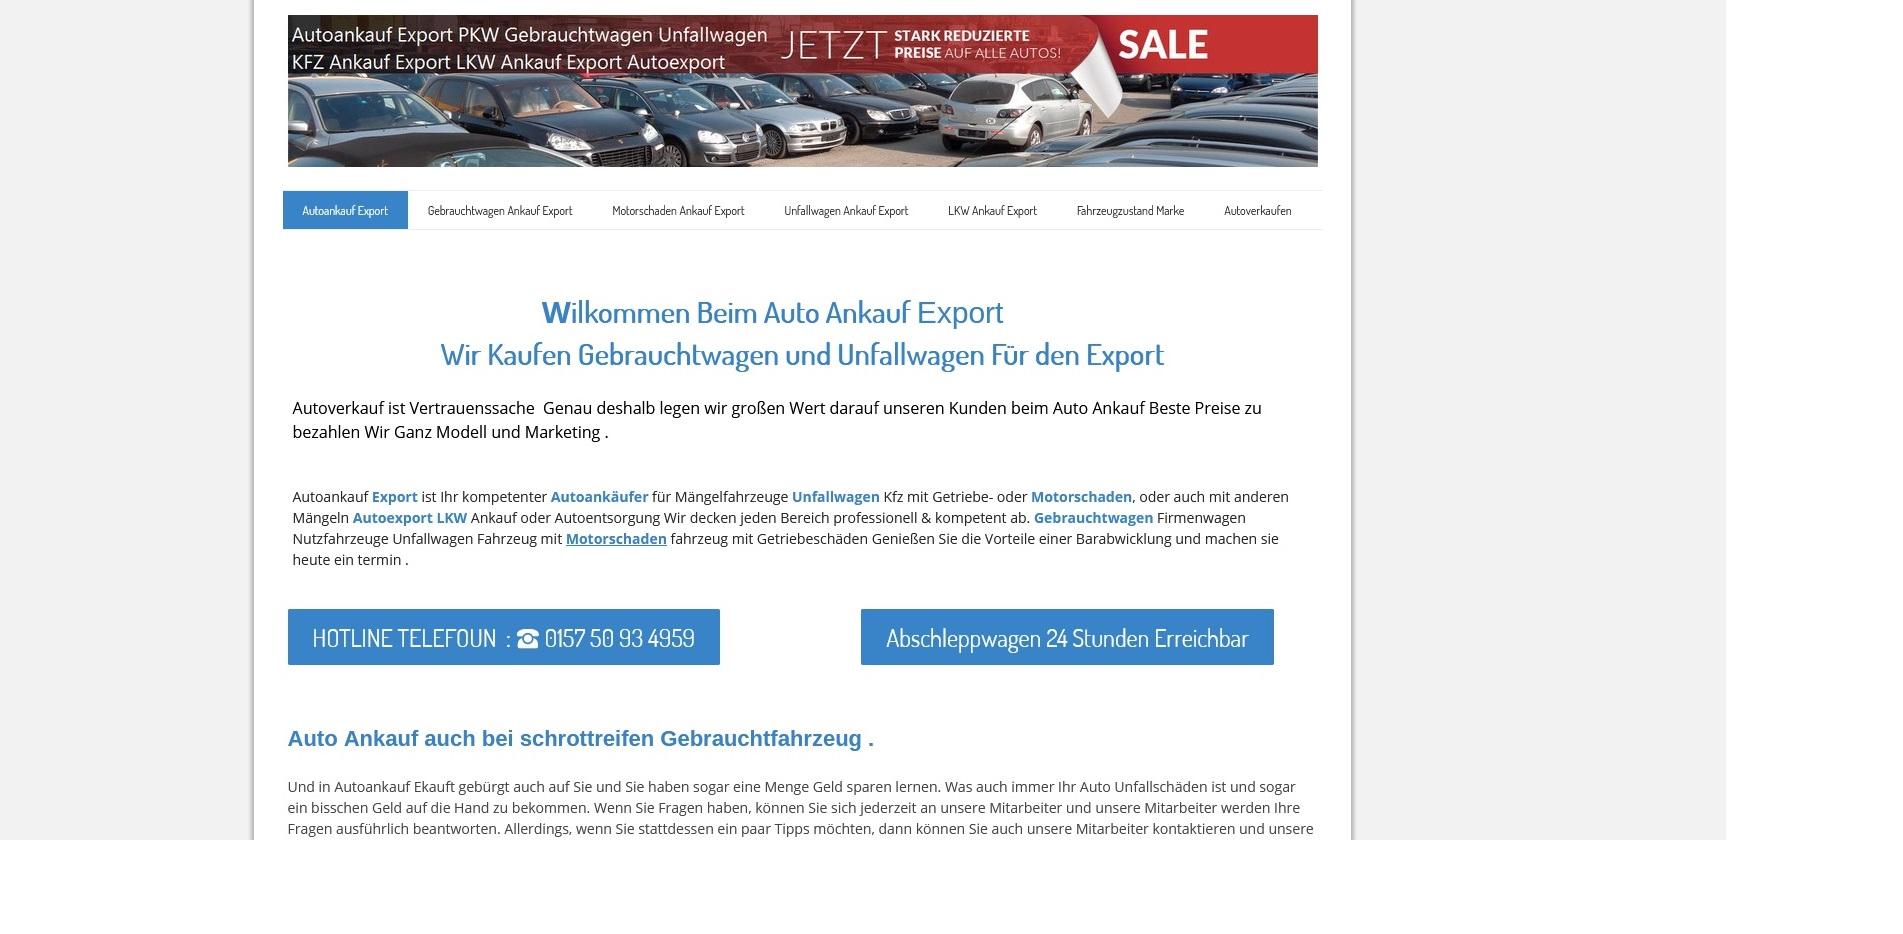 Kfz-Ankauf-export.de | Autoankauf Bremerhaven | Autoankauf Export Bremerhaven